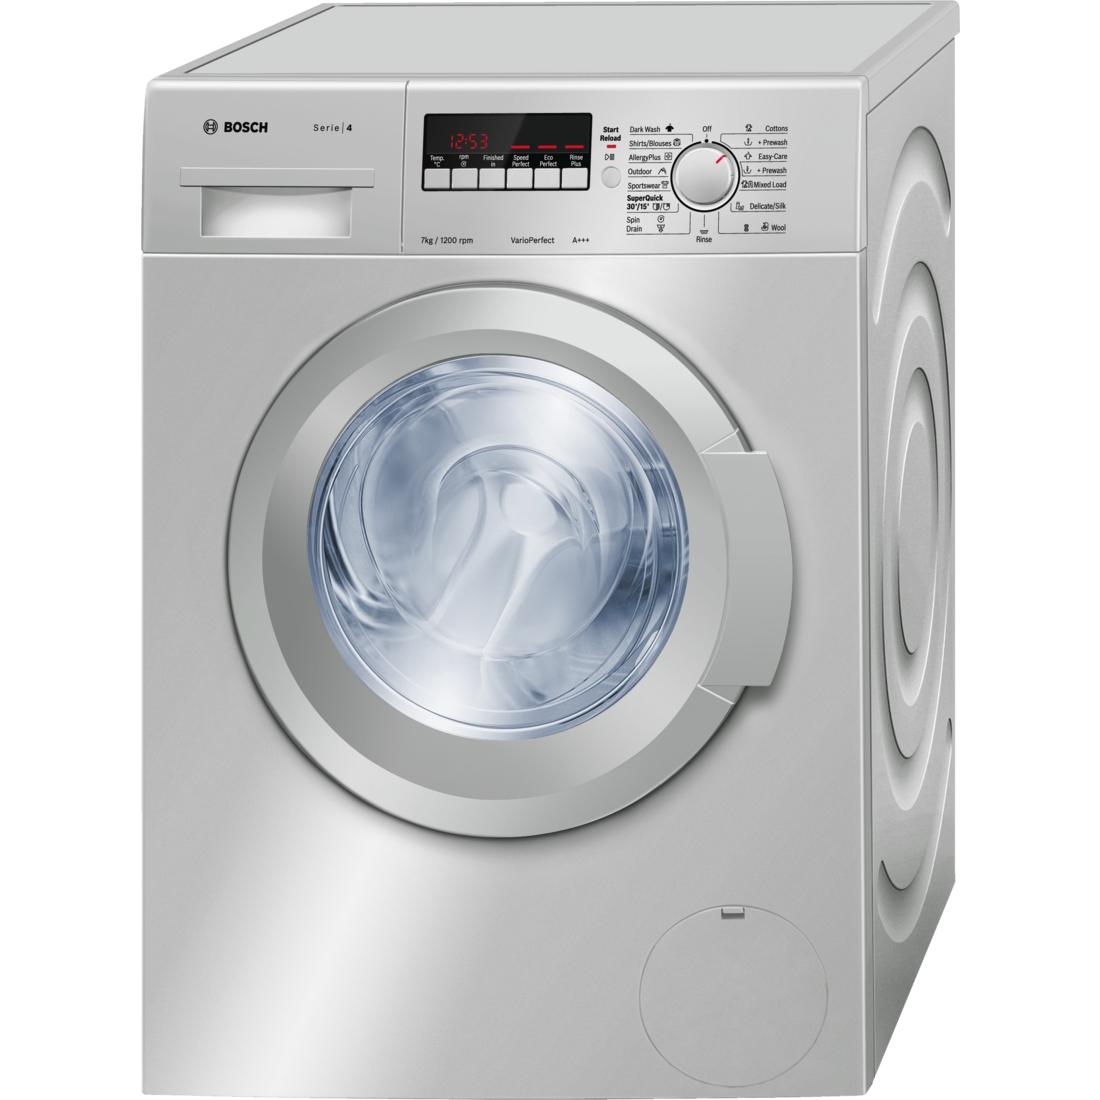 Bosch Wak2427sza Washing Machine Front Load 7kg Silver